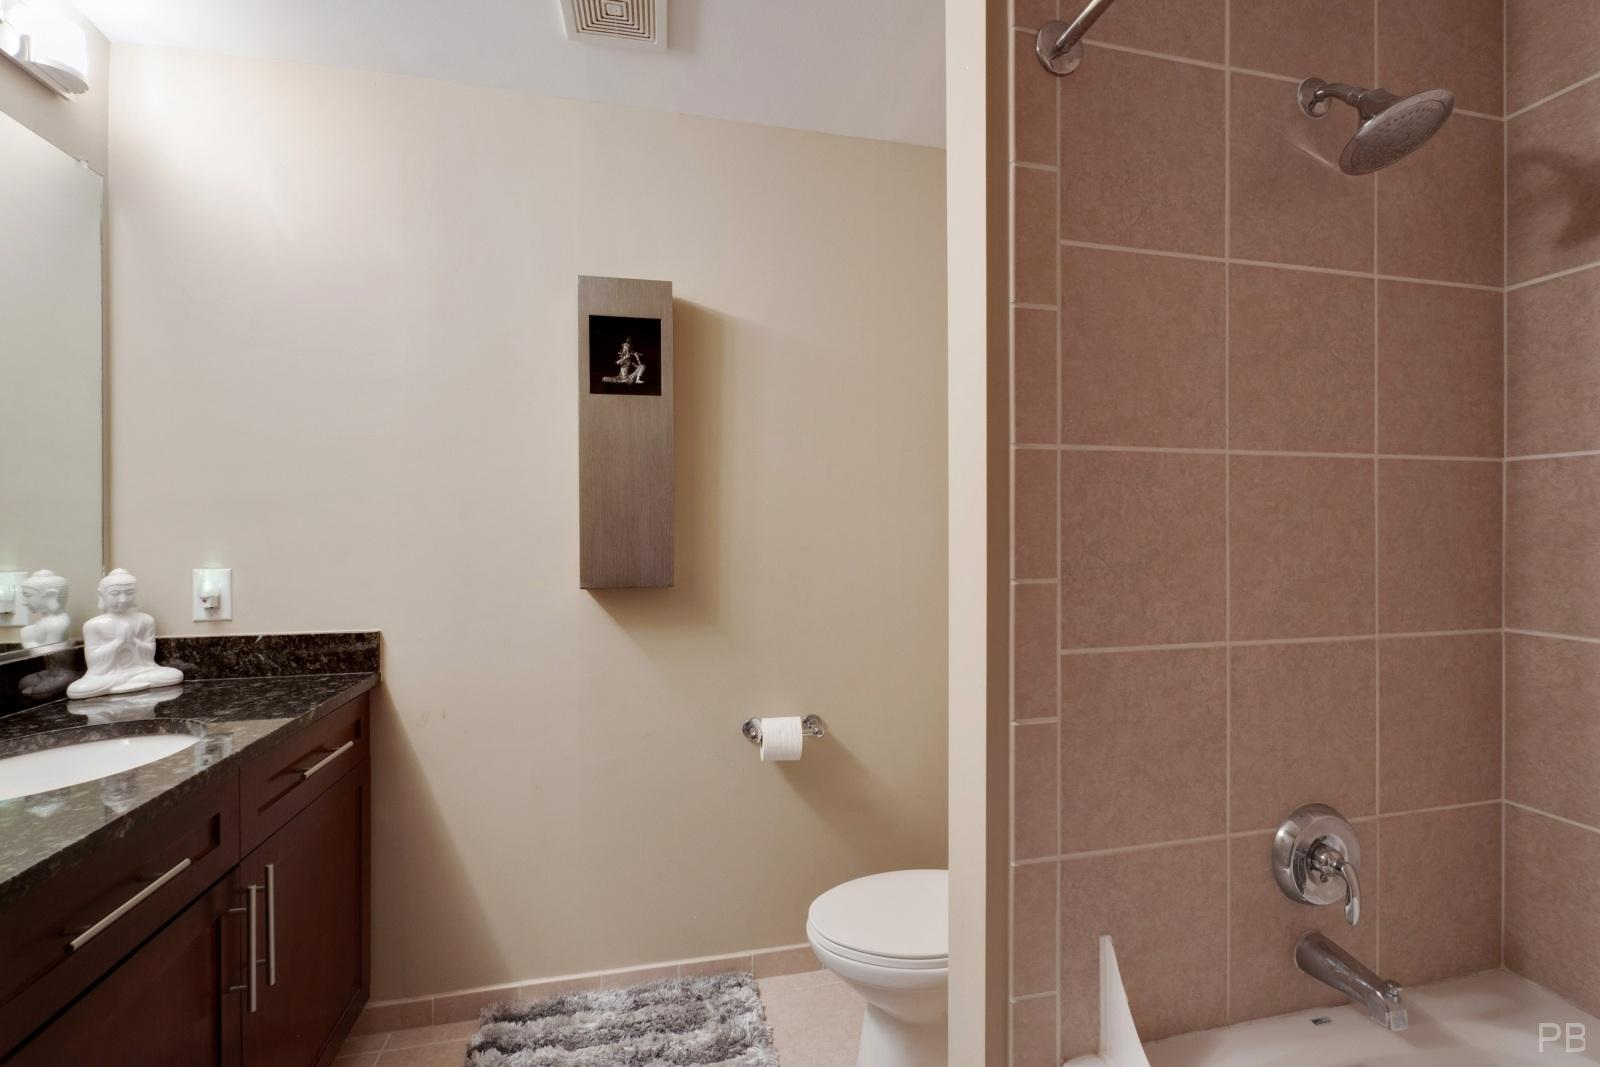 2nd bedroom bathroom with upgraded tub